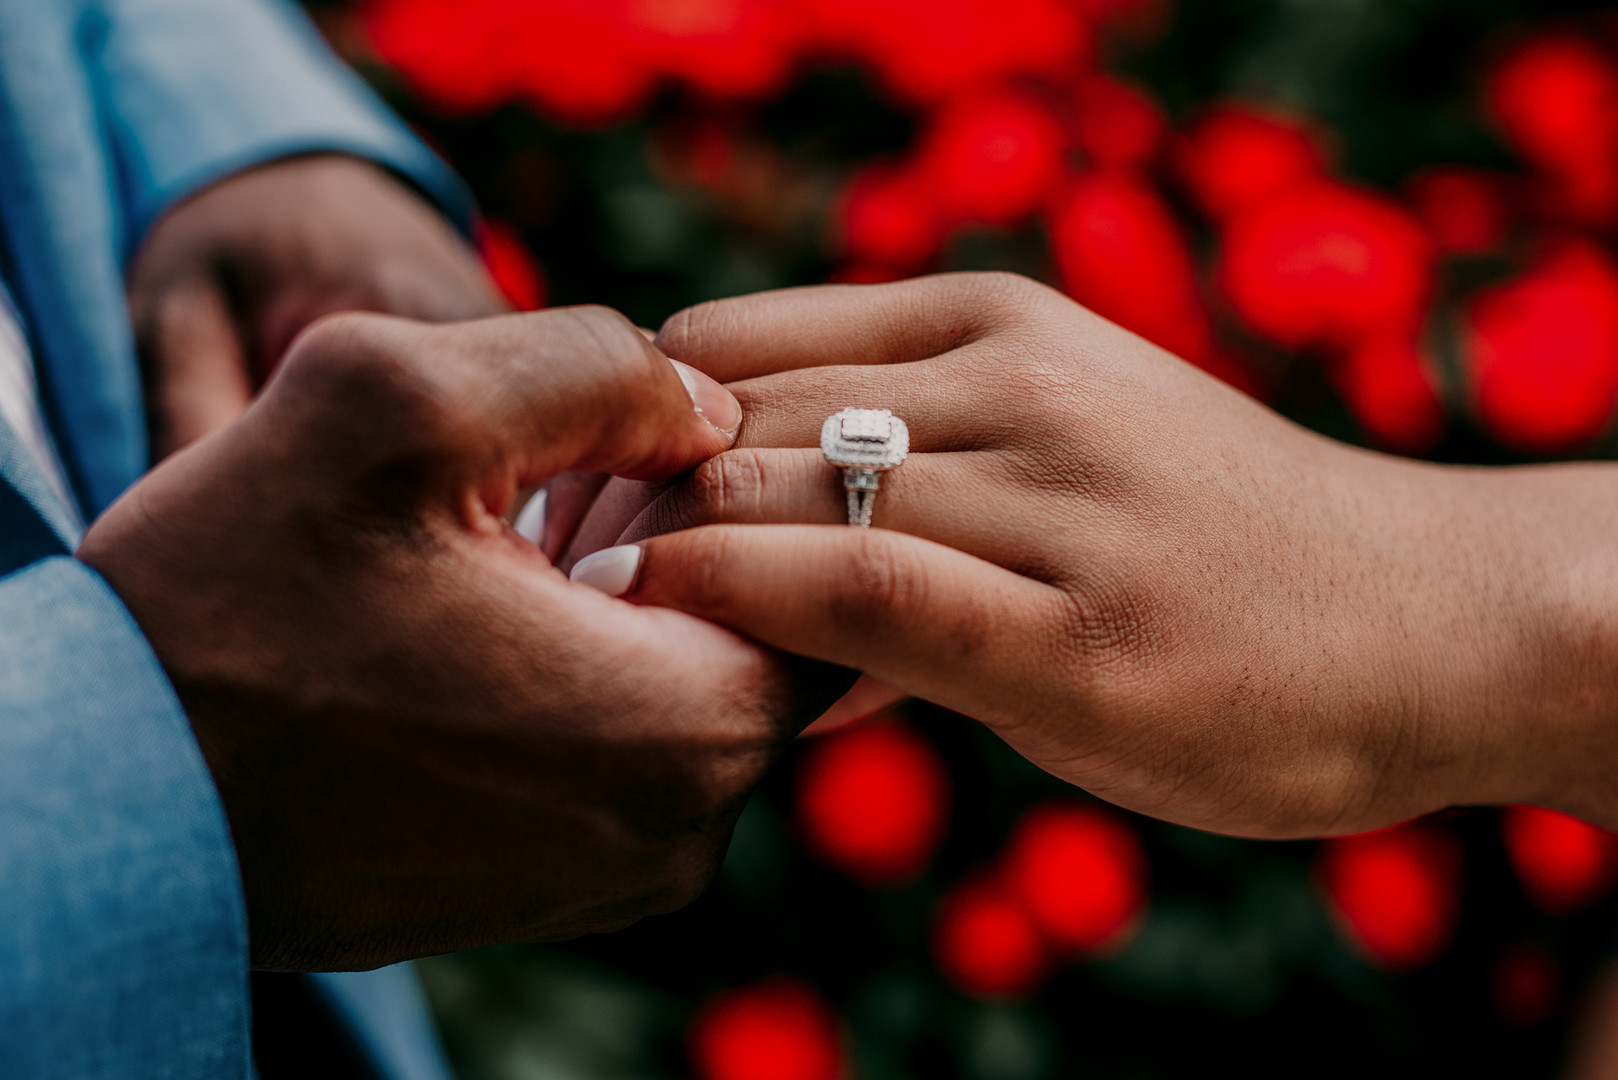 Double Halo Princess Cut Engagement Ring Chicago Engagement Session Emily-Melissa Photography LLC